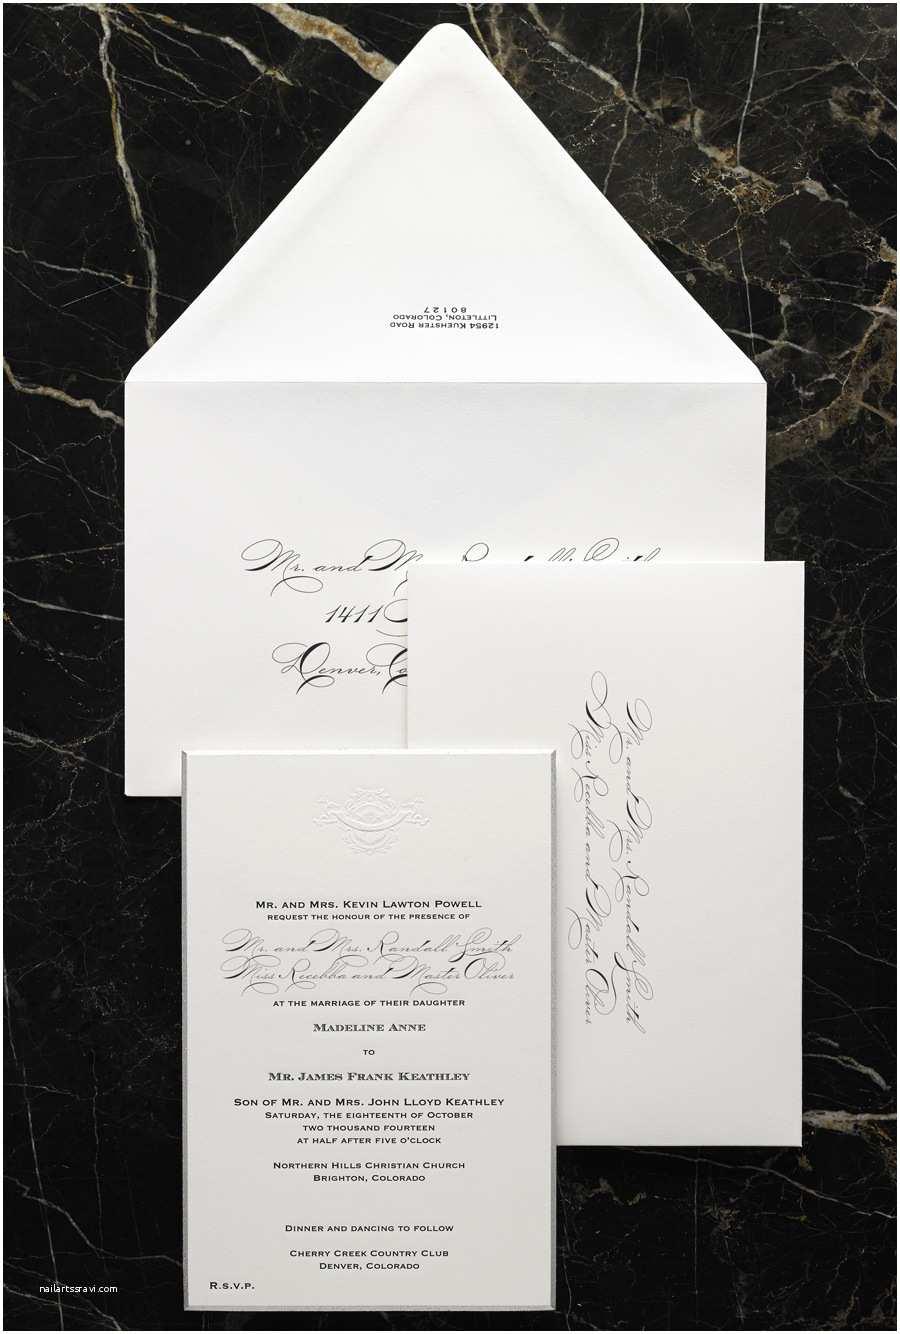 Wedding Invitation attire Wording Modern formal Wedding Invitation Design Etiquette